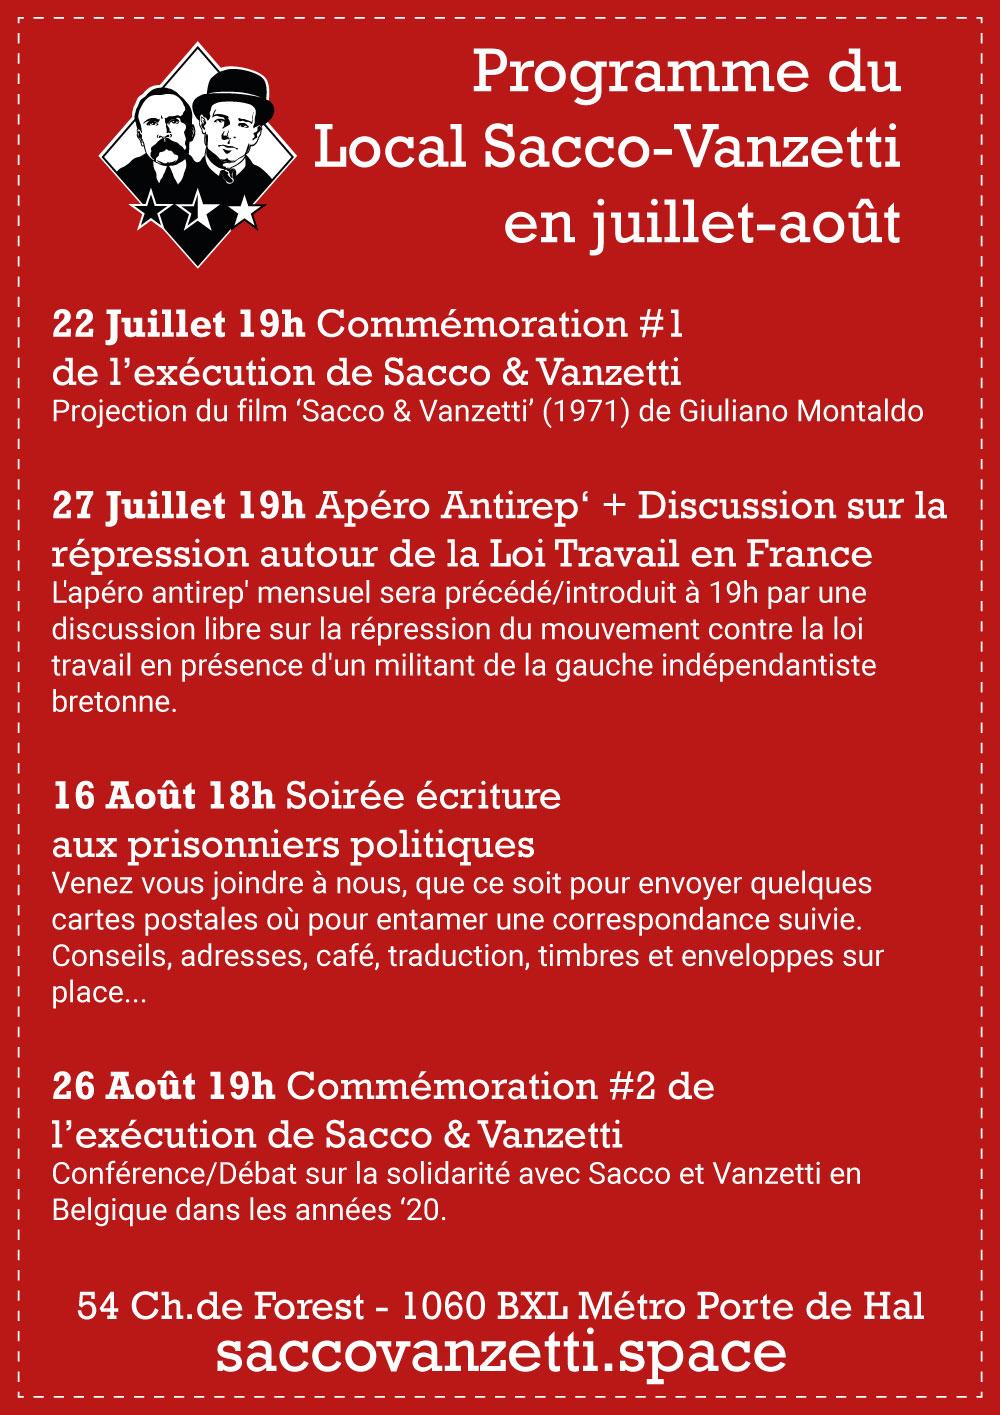 Programme du Sacco-Vanzetti en juillet-août